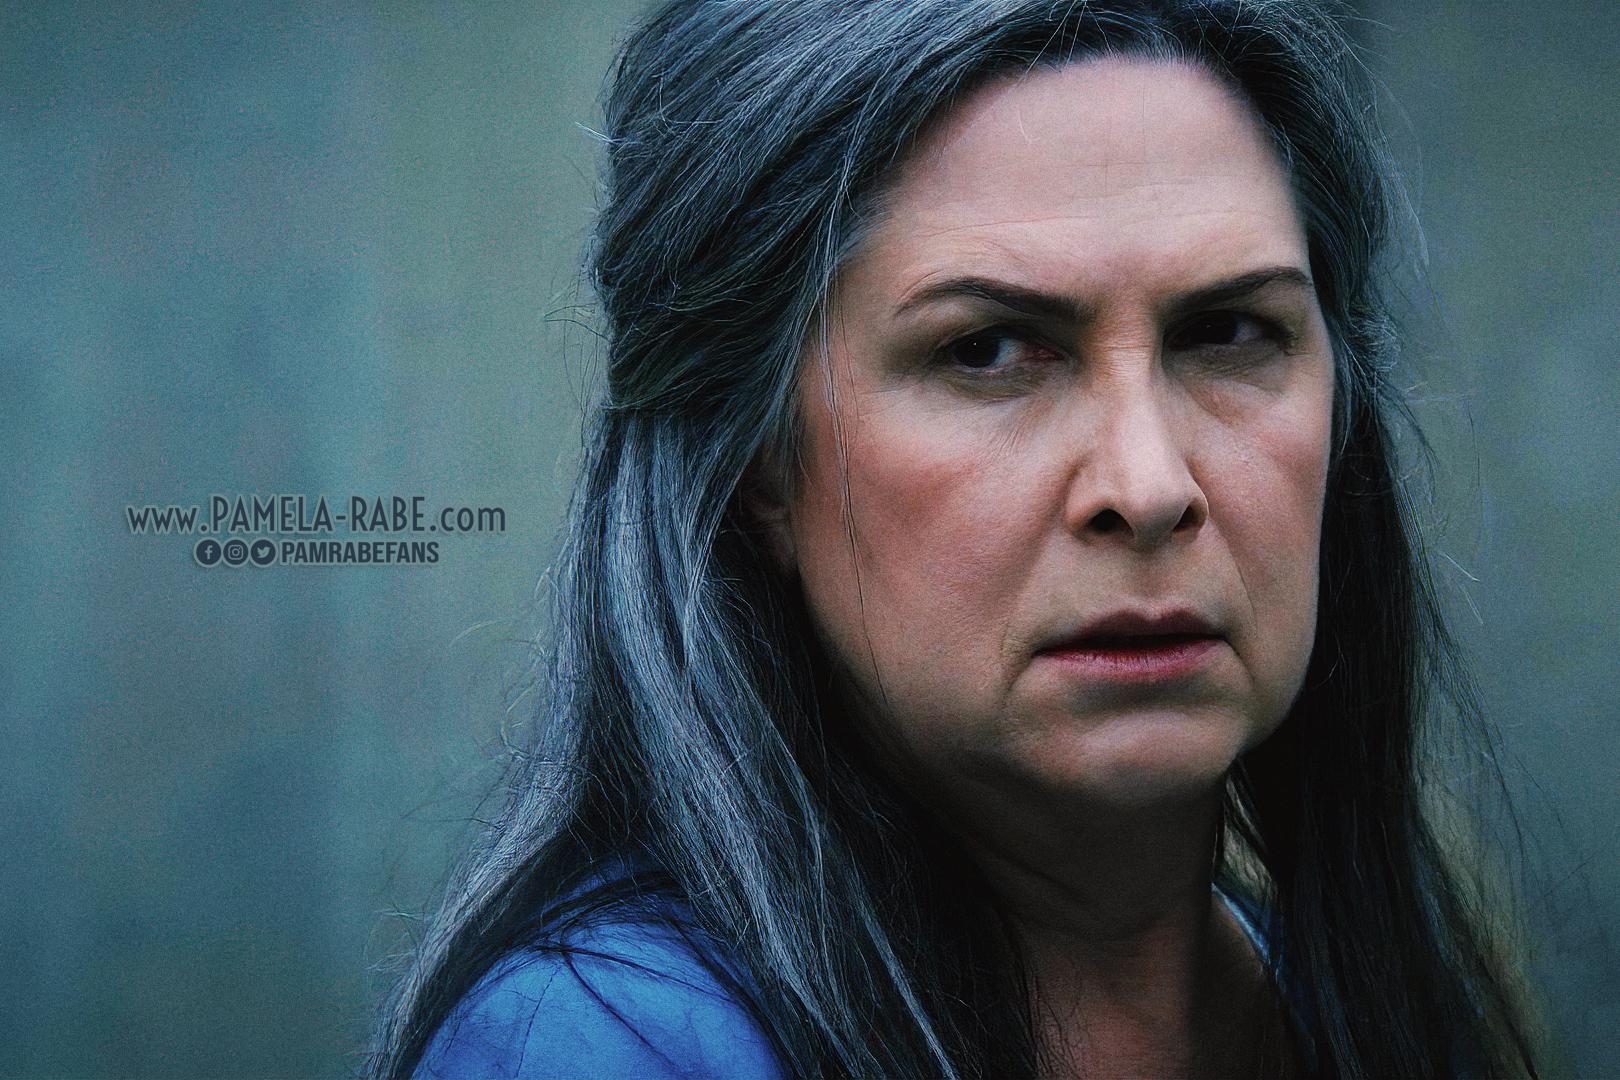 Pamela Rabe in Wentworth Season 8 | Edit by www.Pamela-Rabe.com